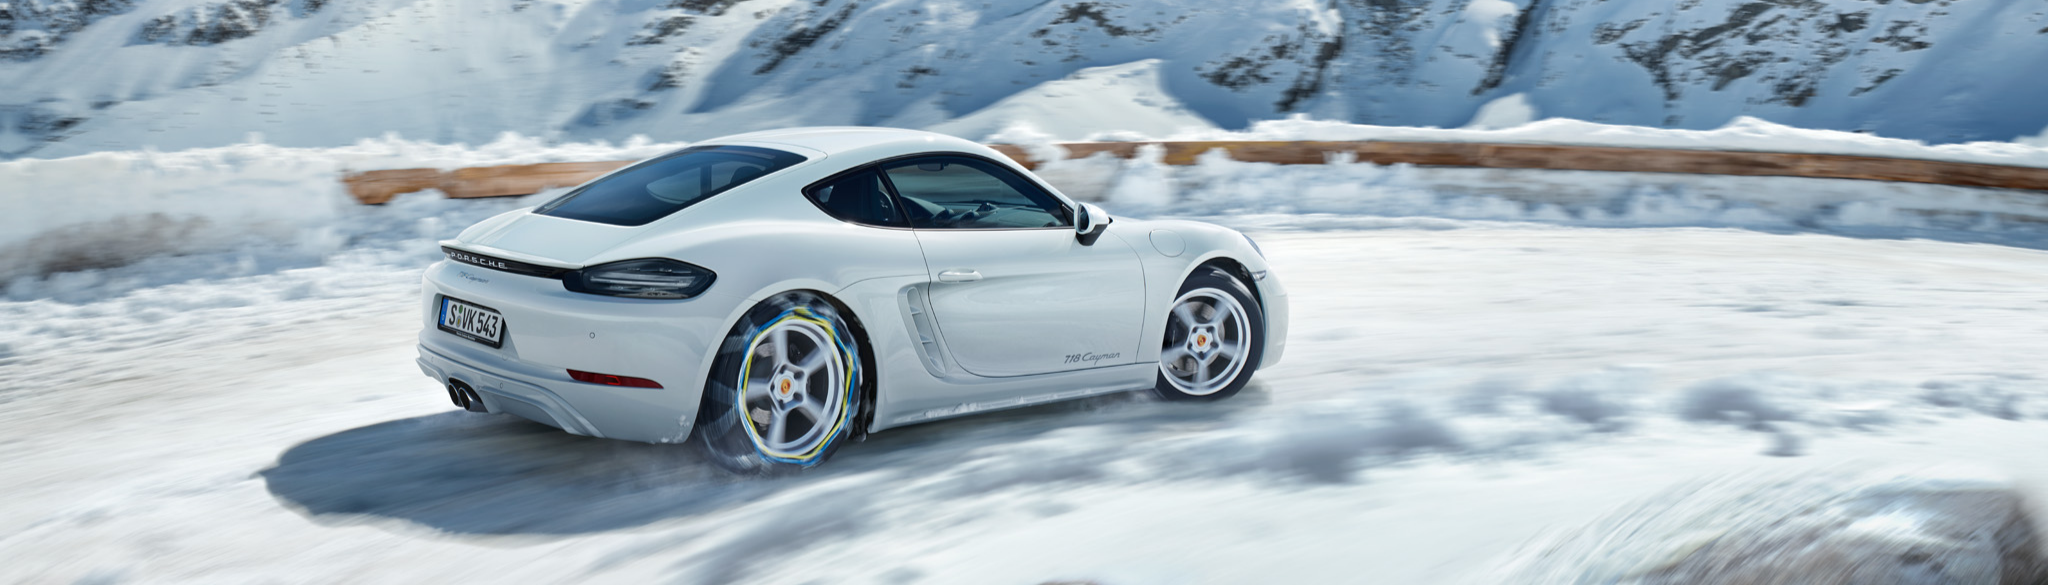 White Porsche In Stock